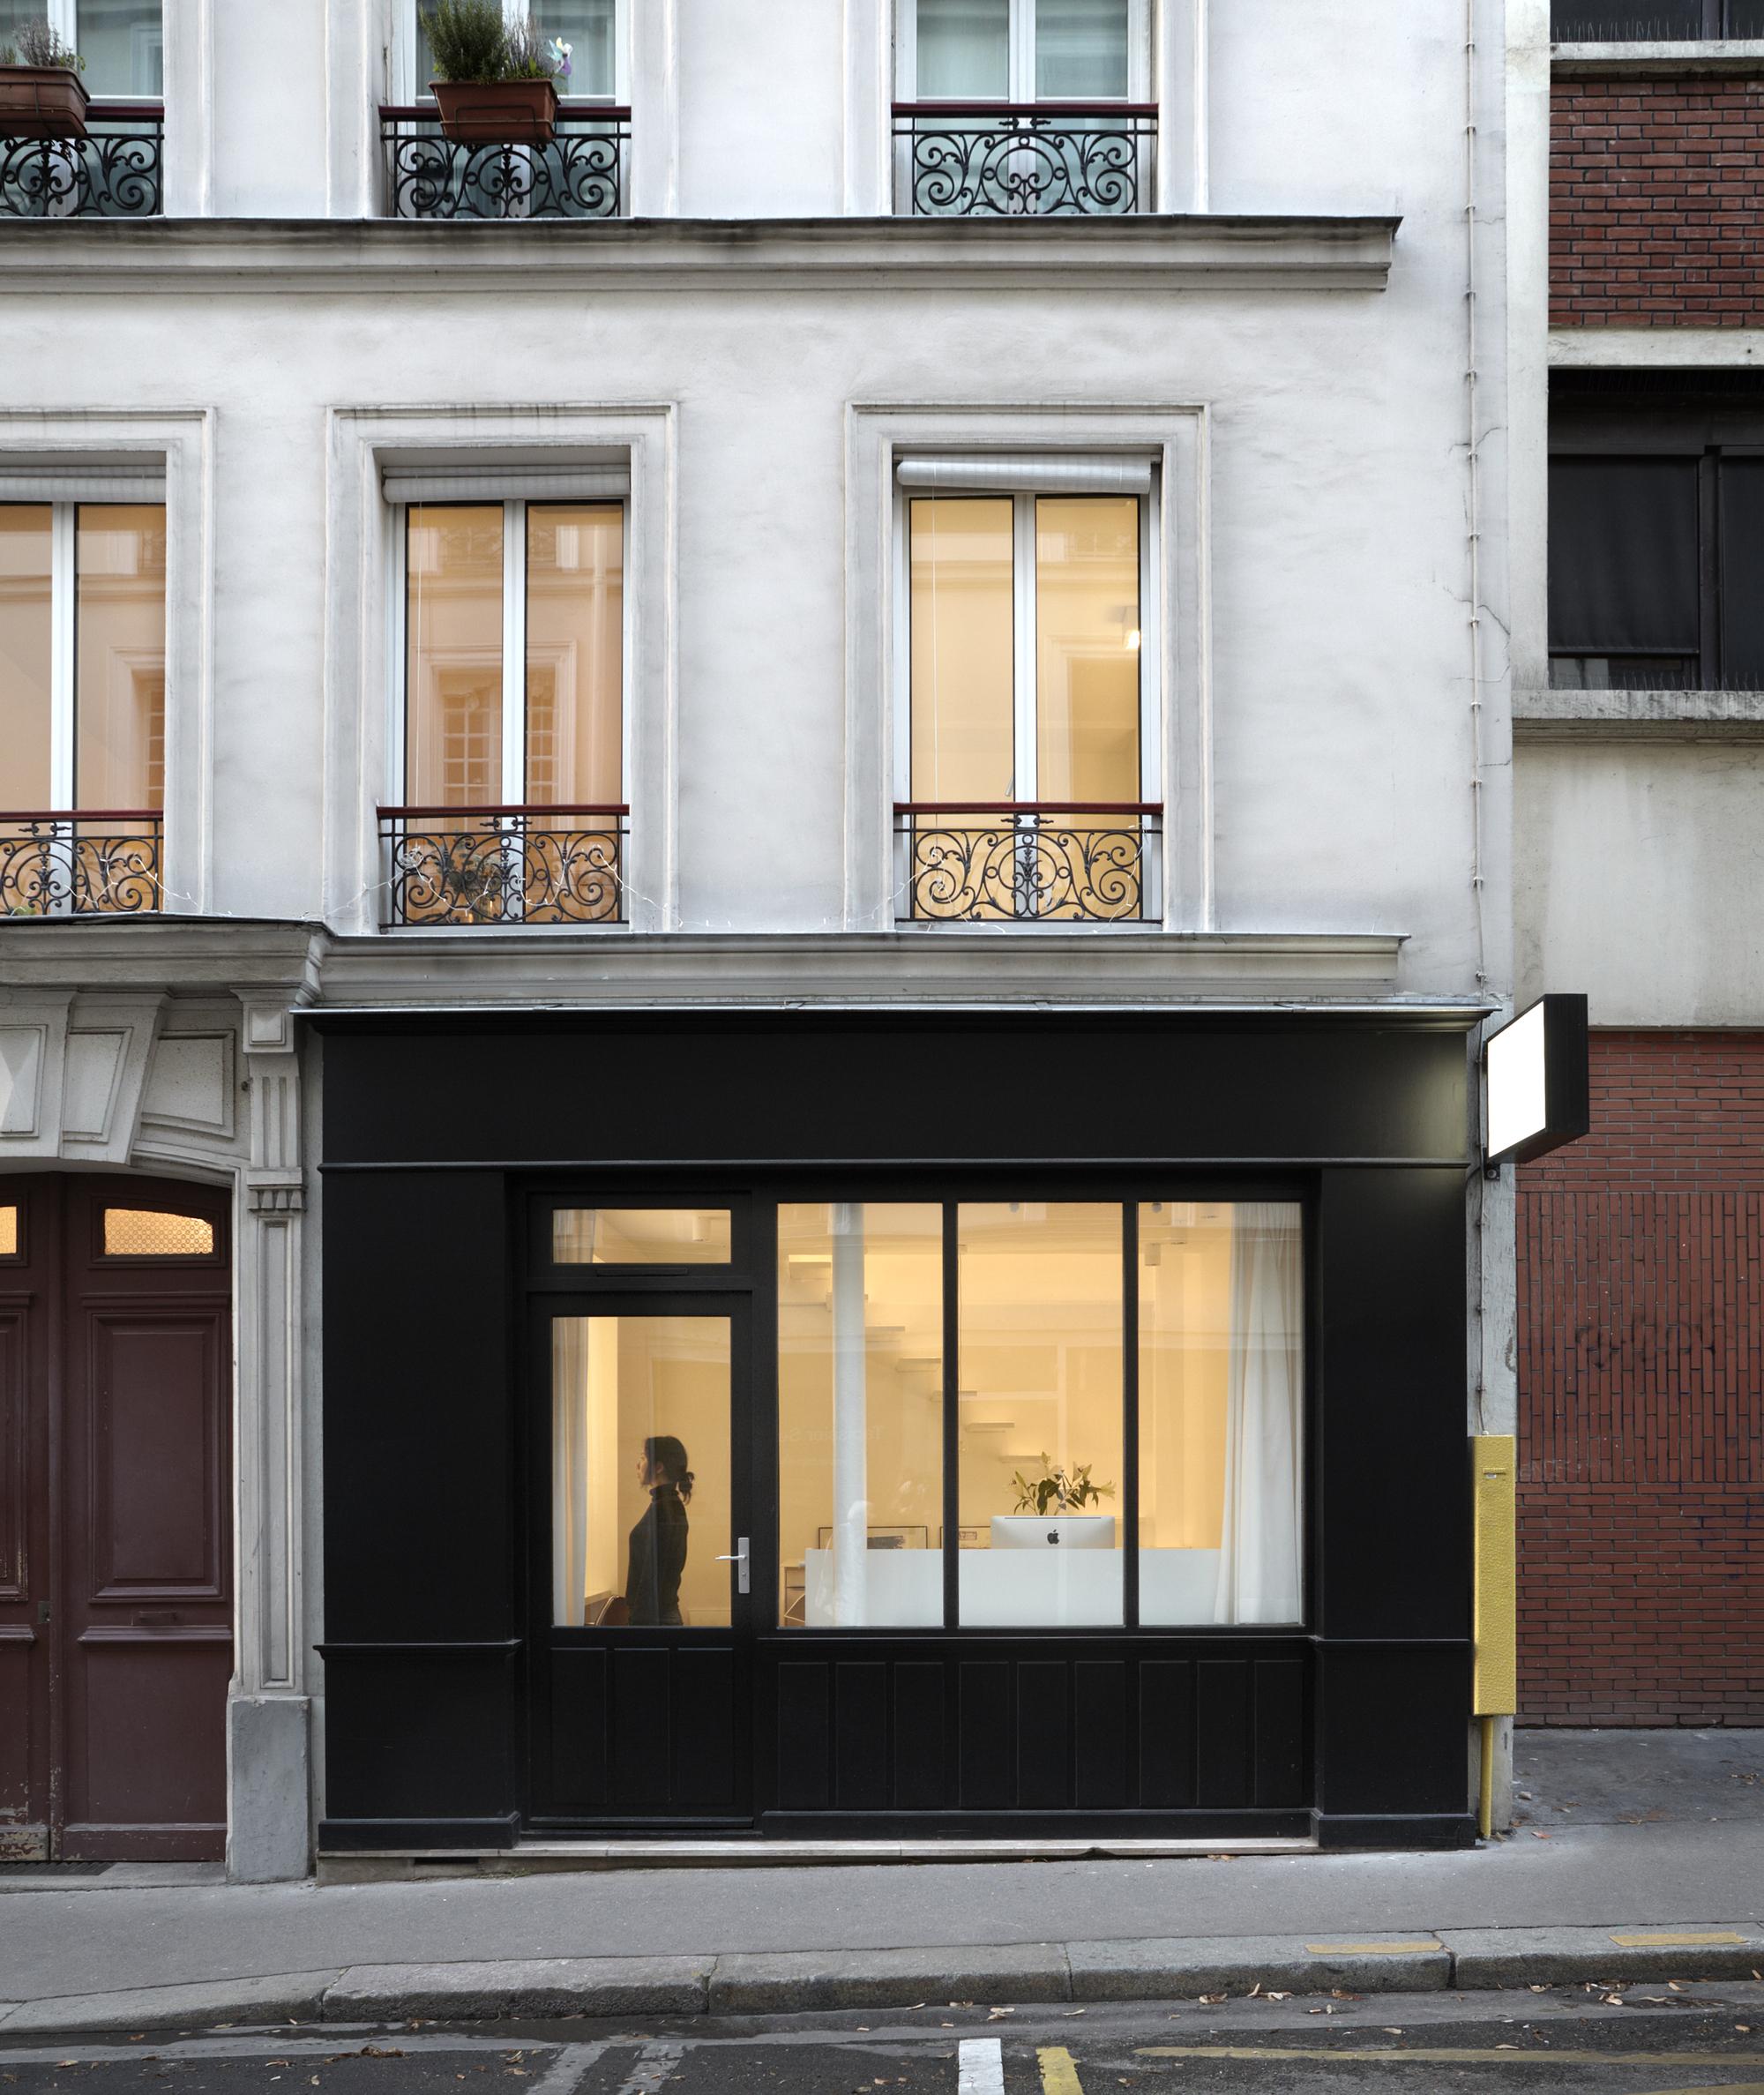 Triplex in Paris / Studio Pan